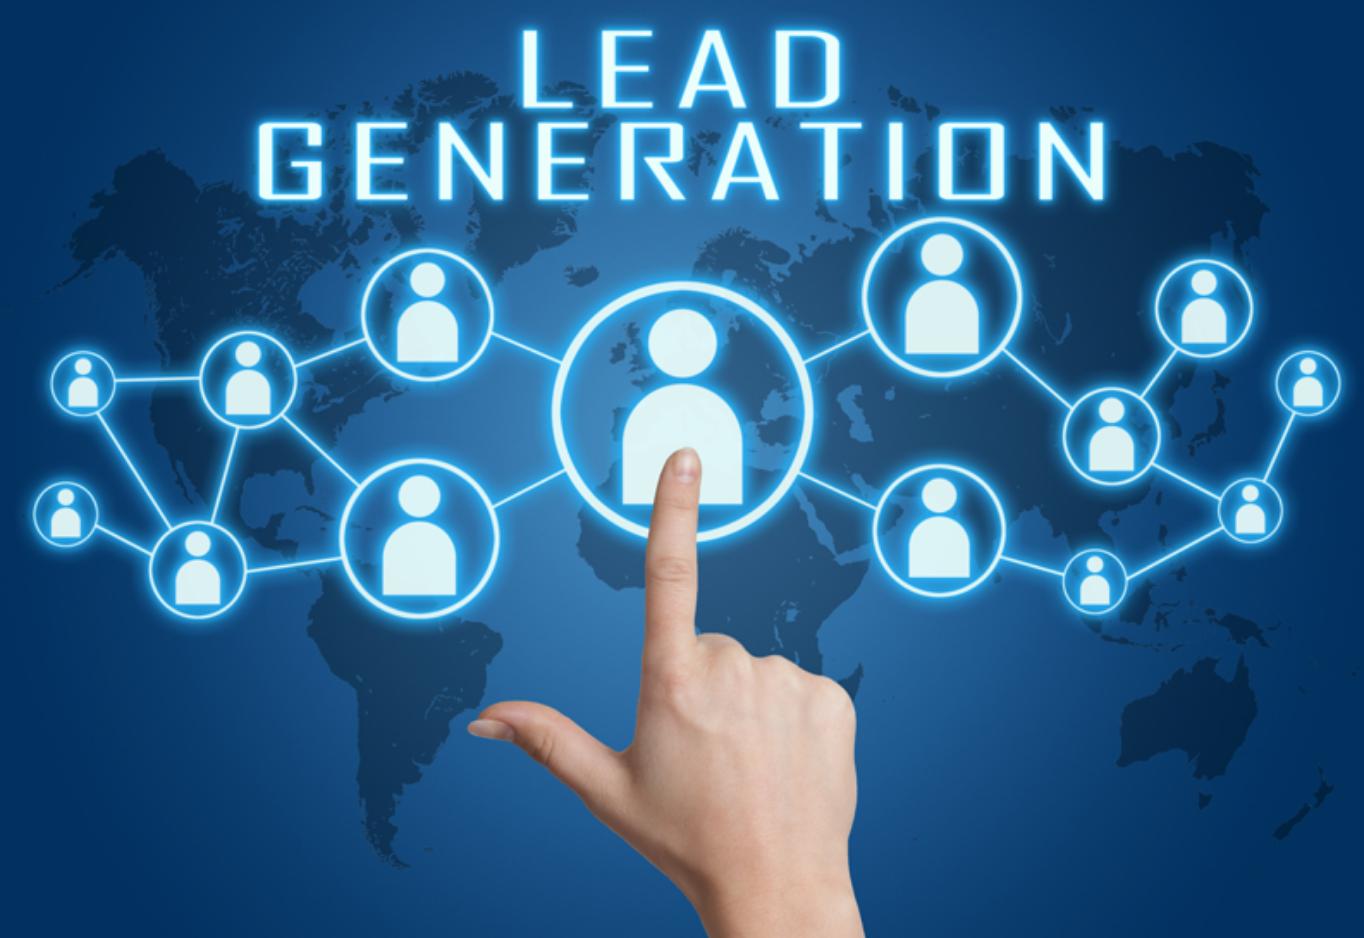 Lead Generation & Virtual Assistant